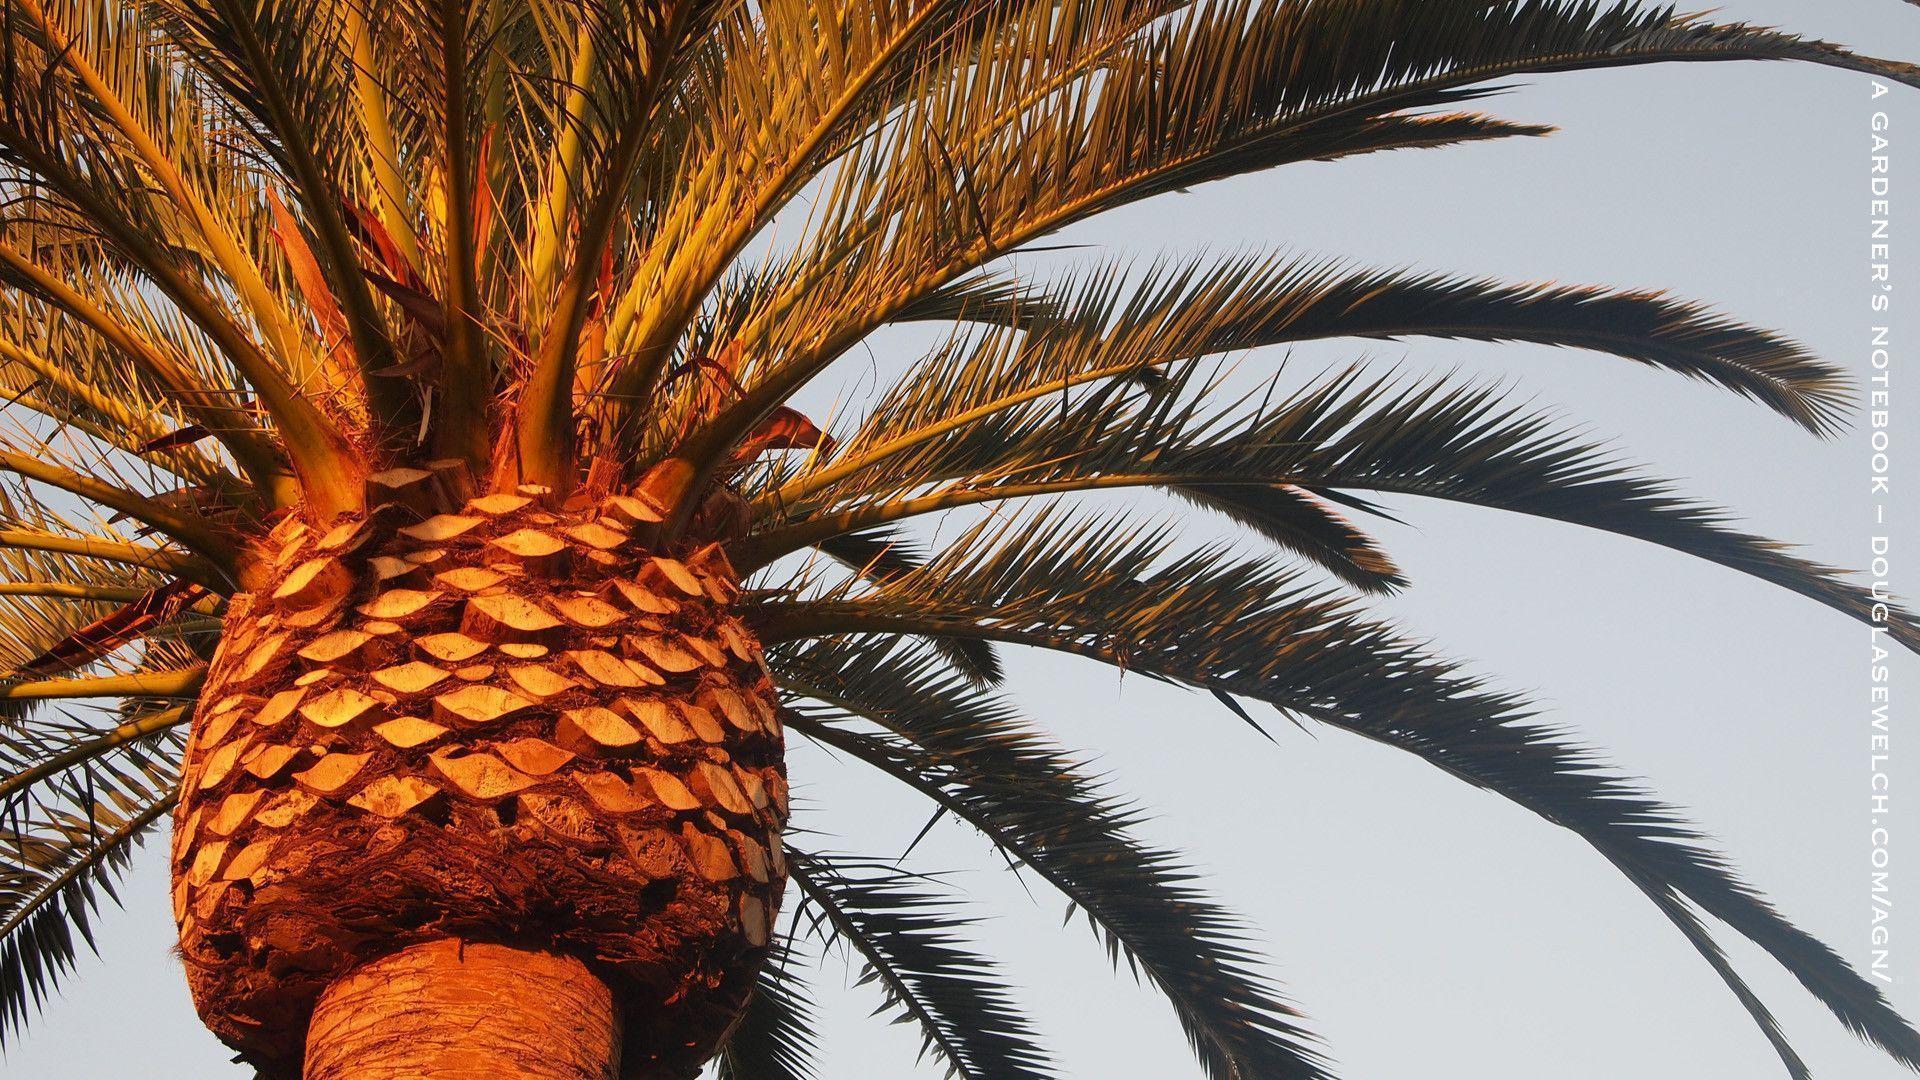 stussy wallpaper palm trees - photo #32